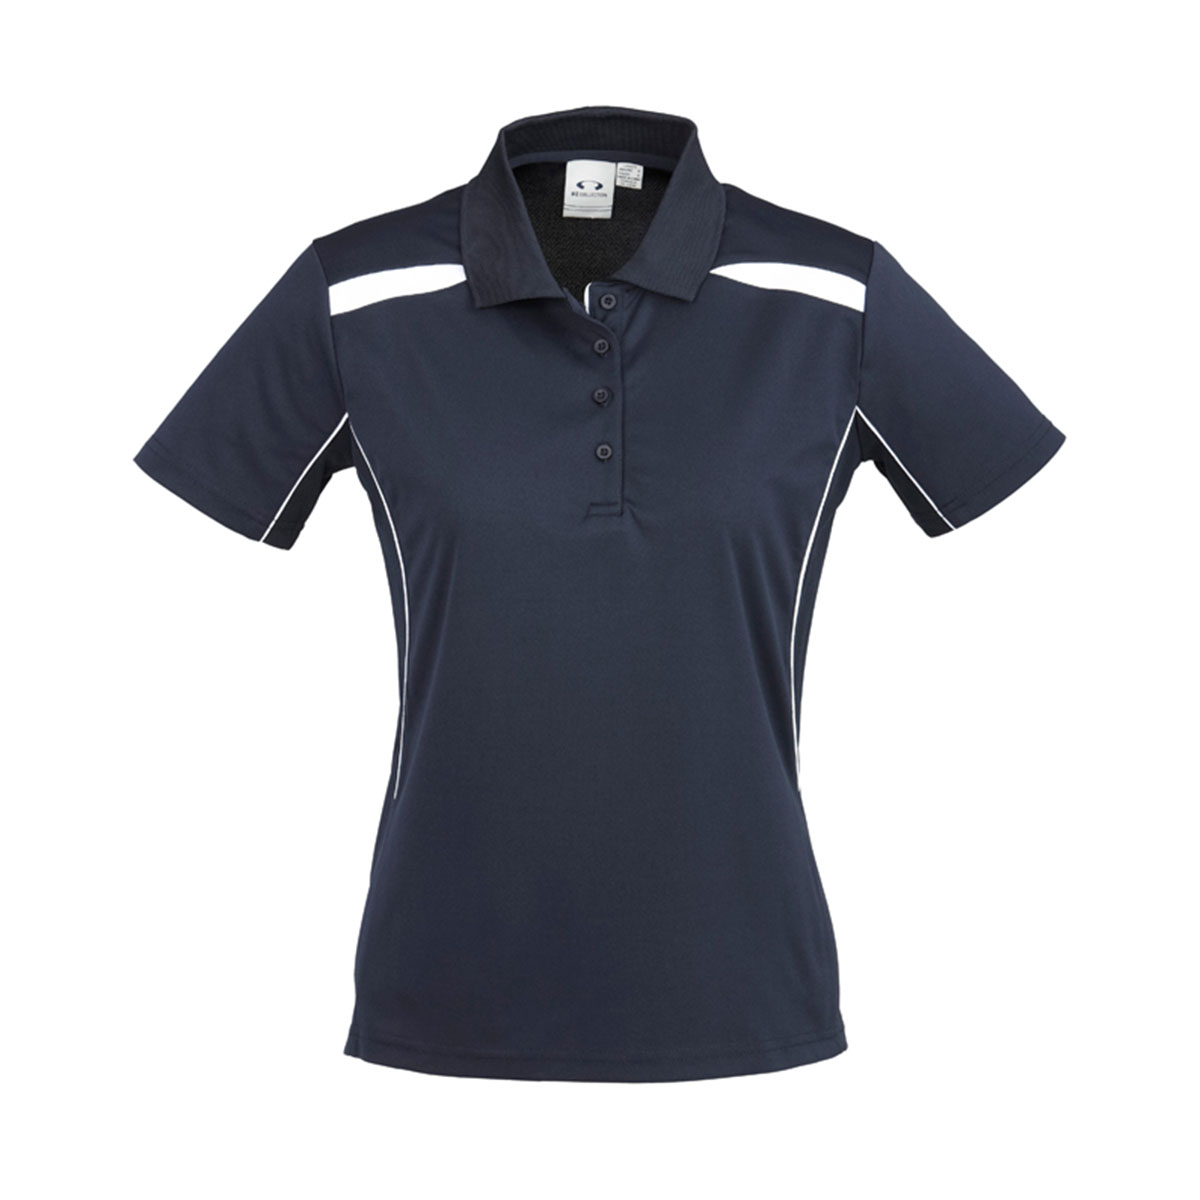 Ladies United Short Sleeve Polo-Navy / White